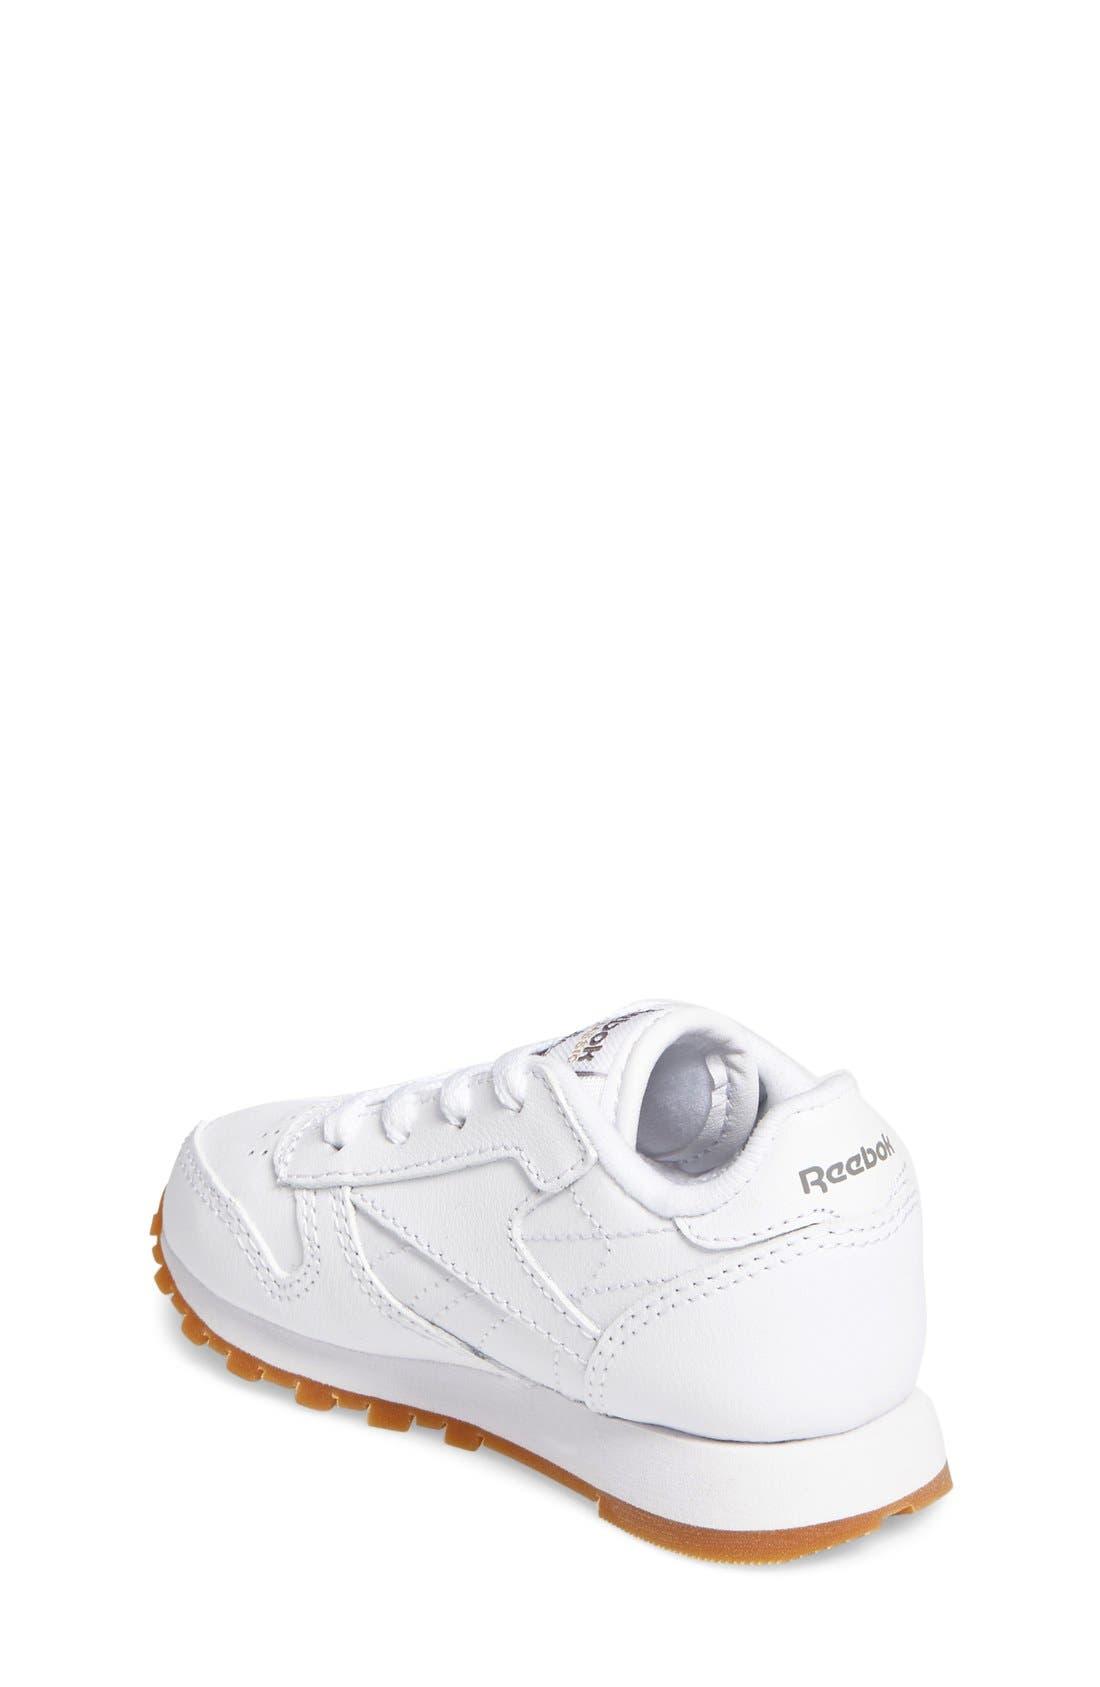 Classic Leather Sneaker,                             Alternate thumbnail 2, color,                             White/ Gum